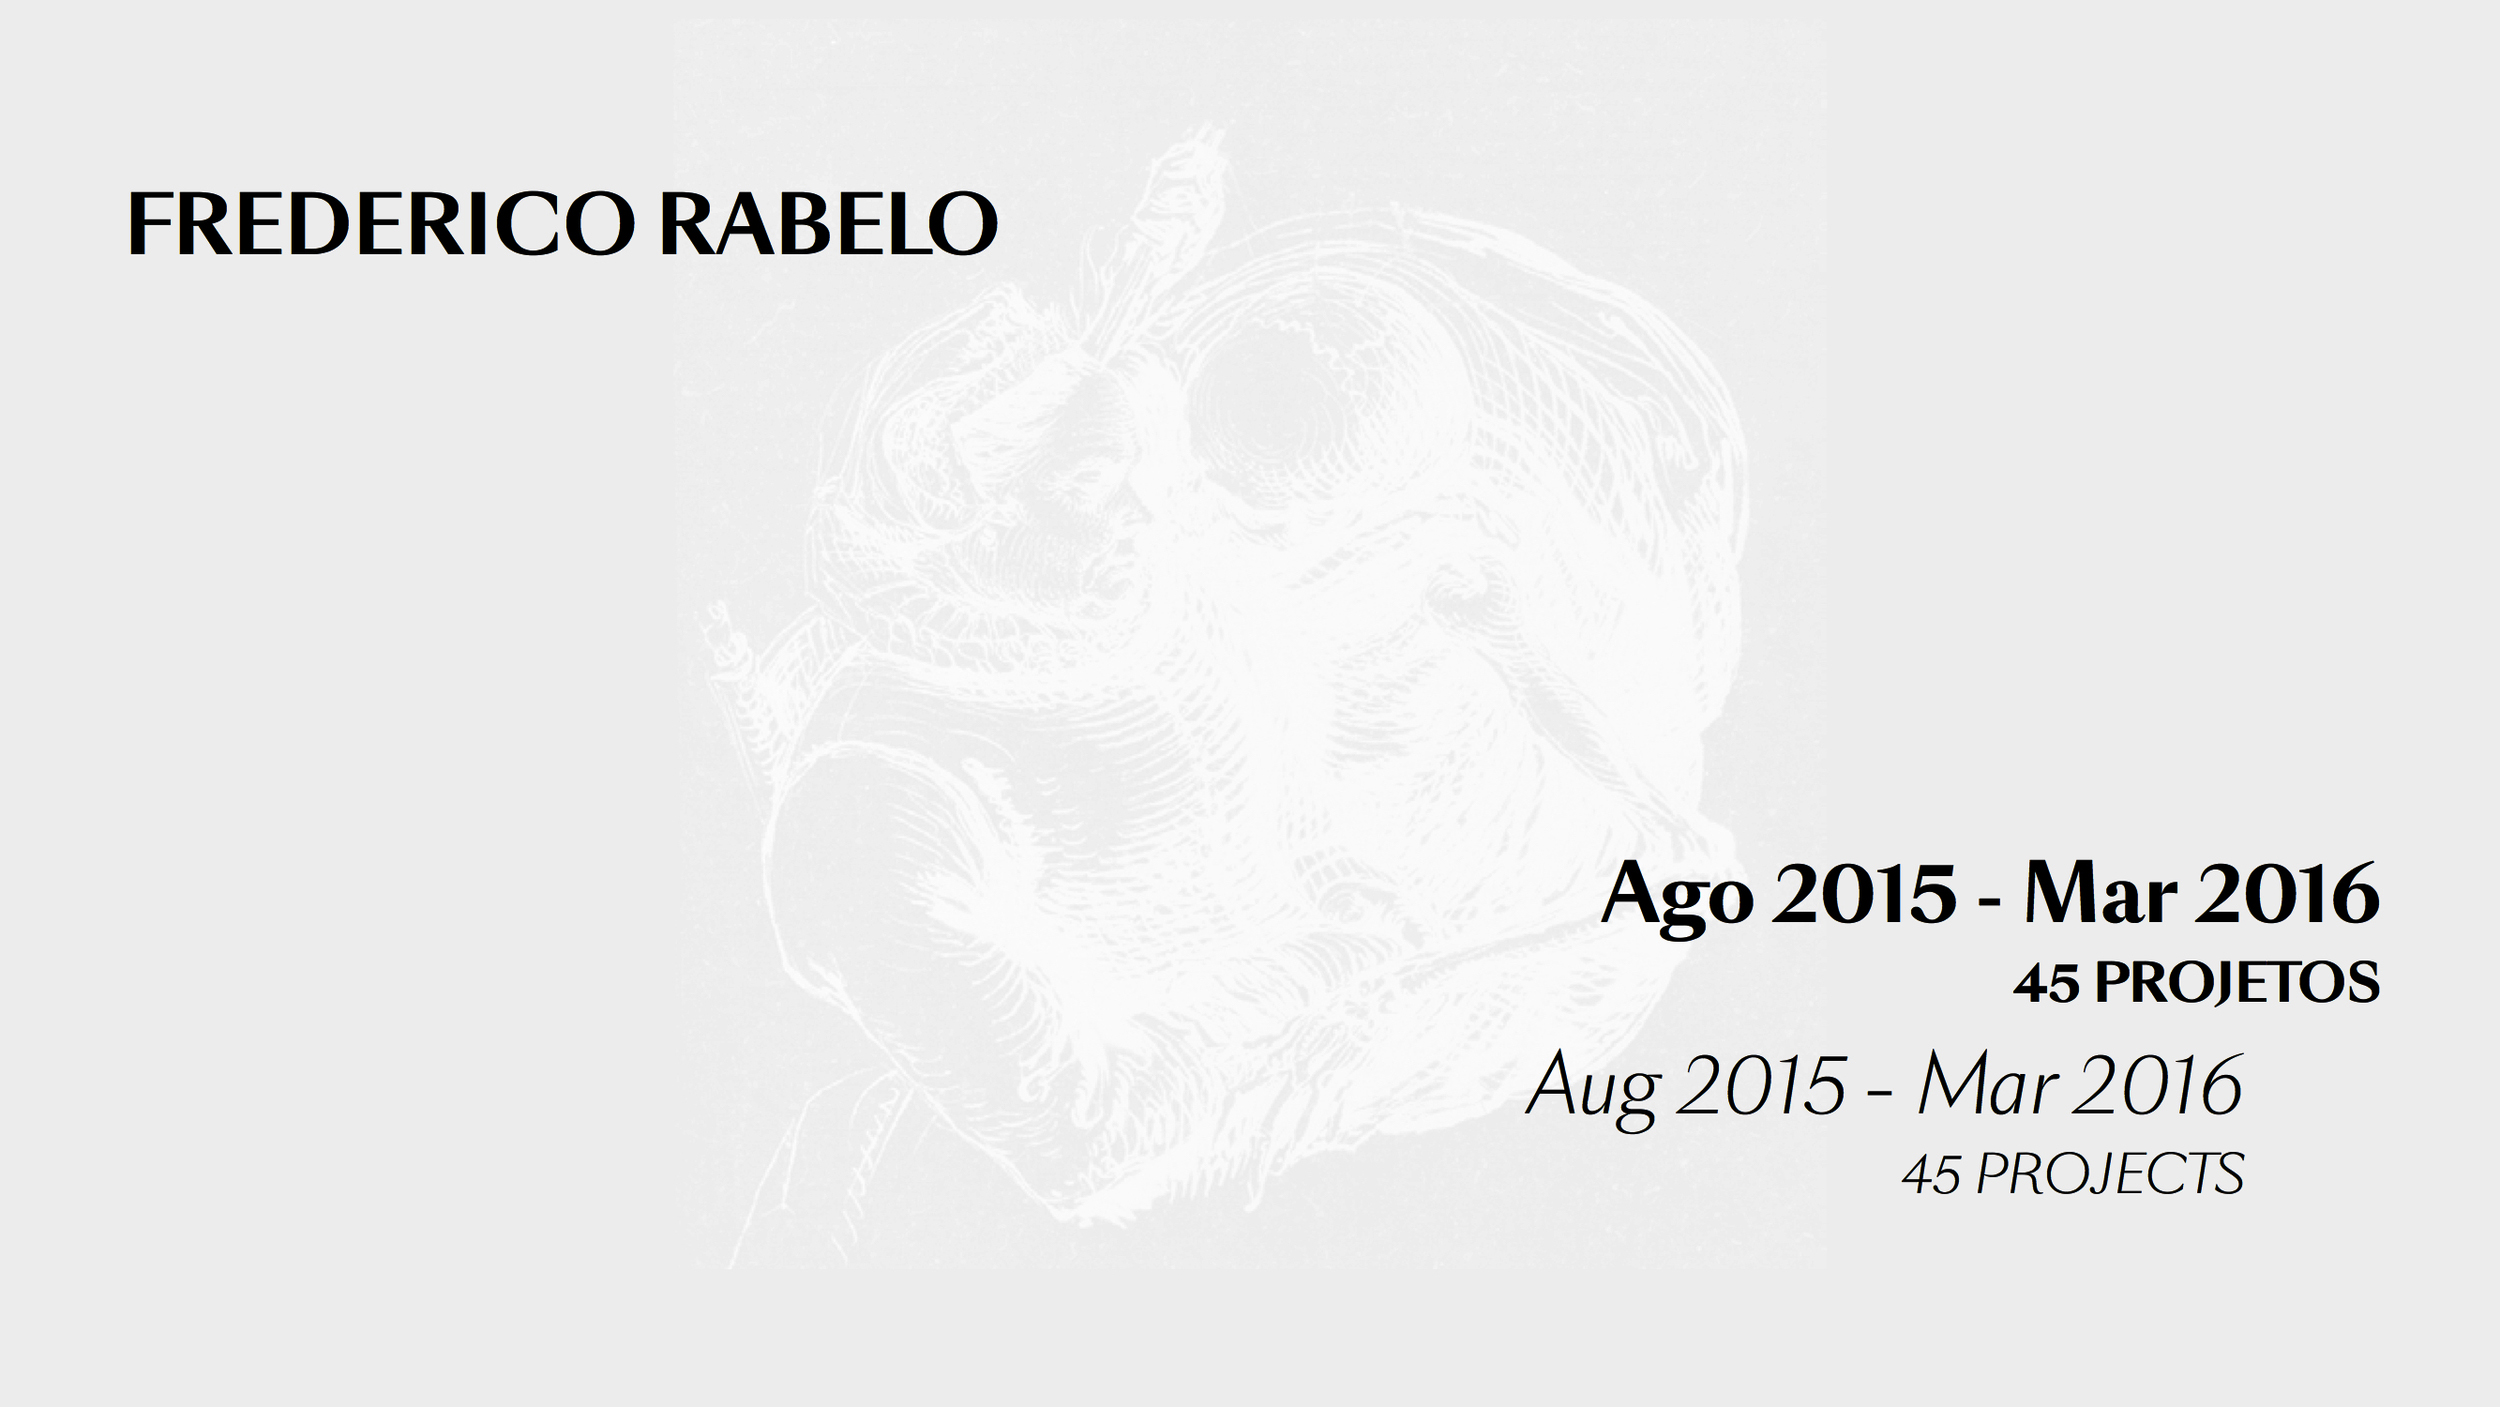 Frederico+Rabelo+2015-2016+BR.jpg